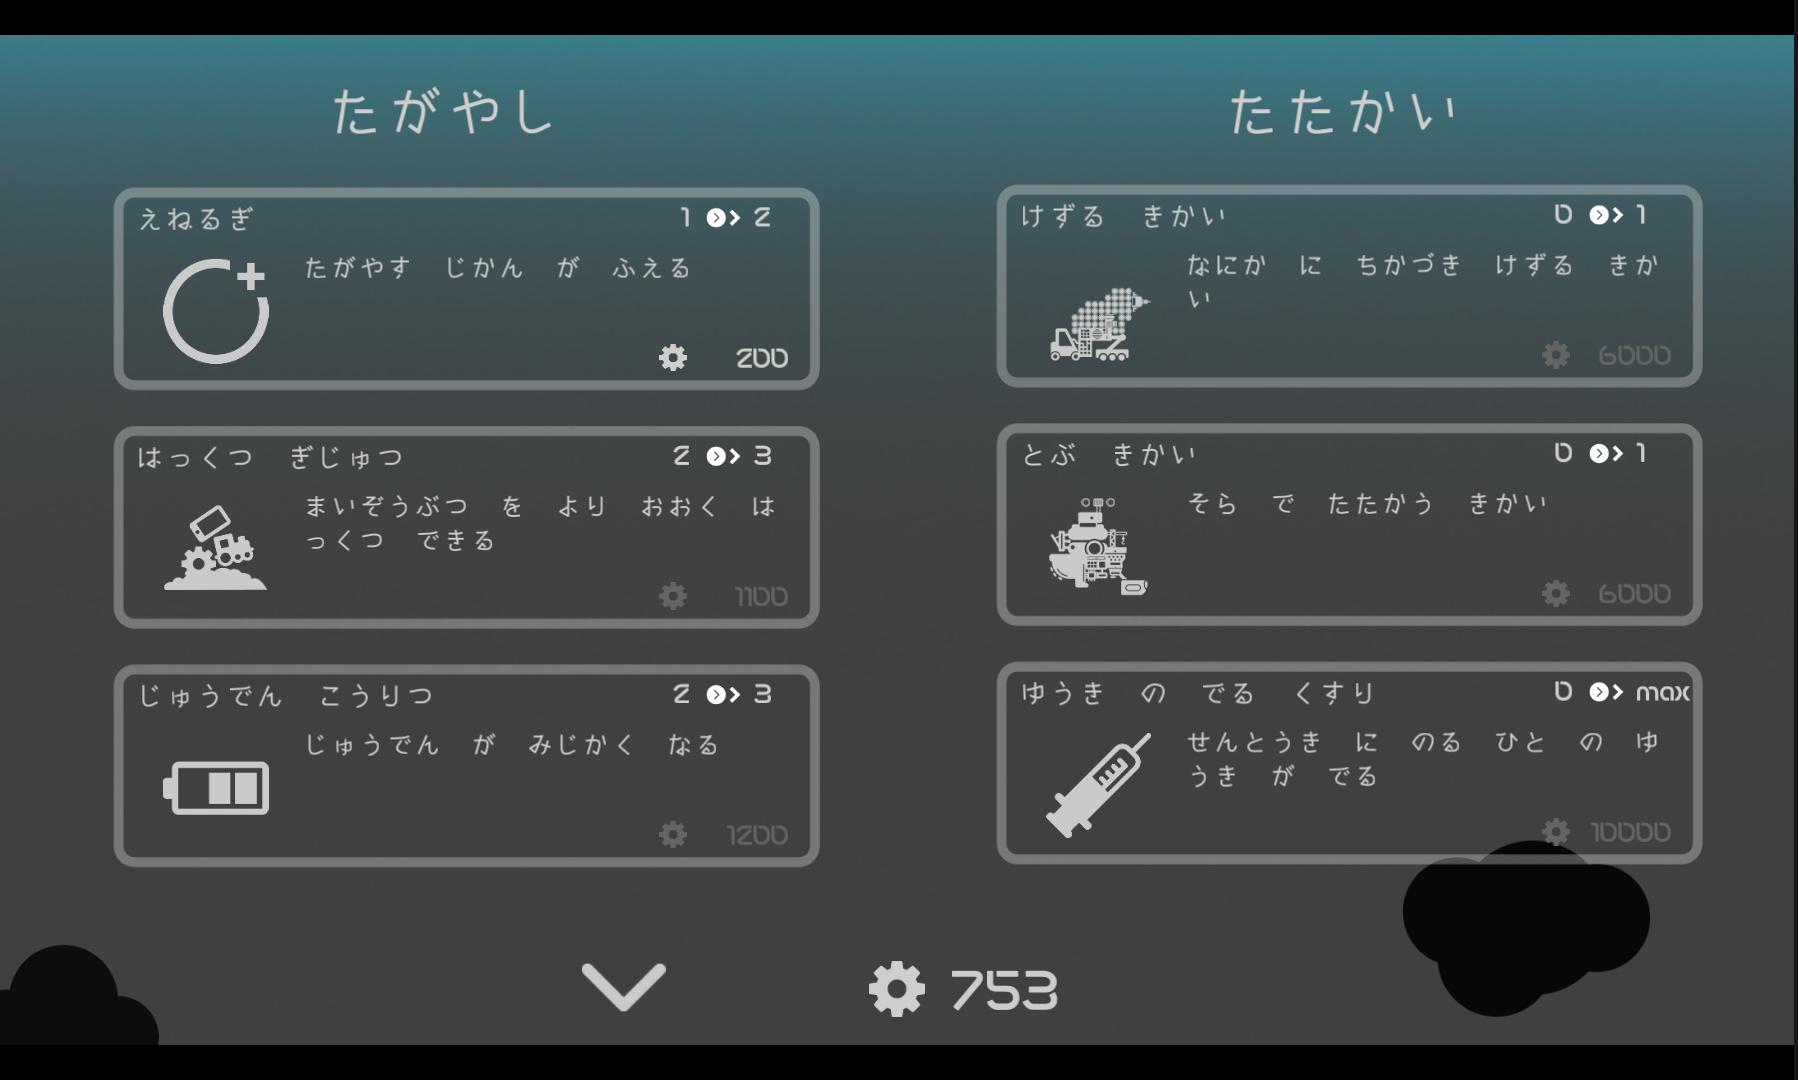 androidアプリ ひとたがやし攻略スクリーンショット8